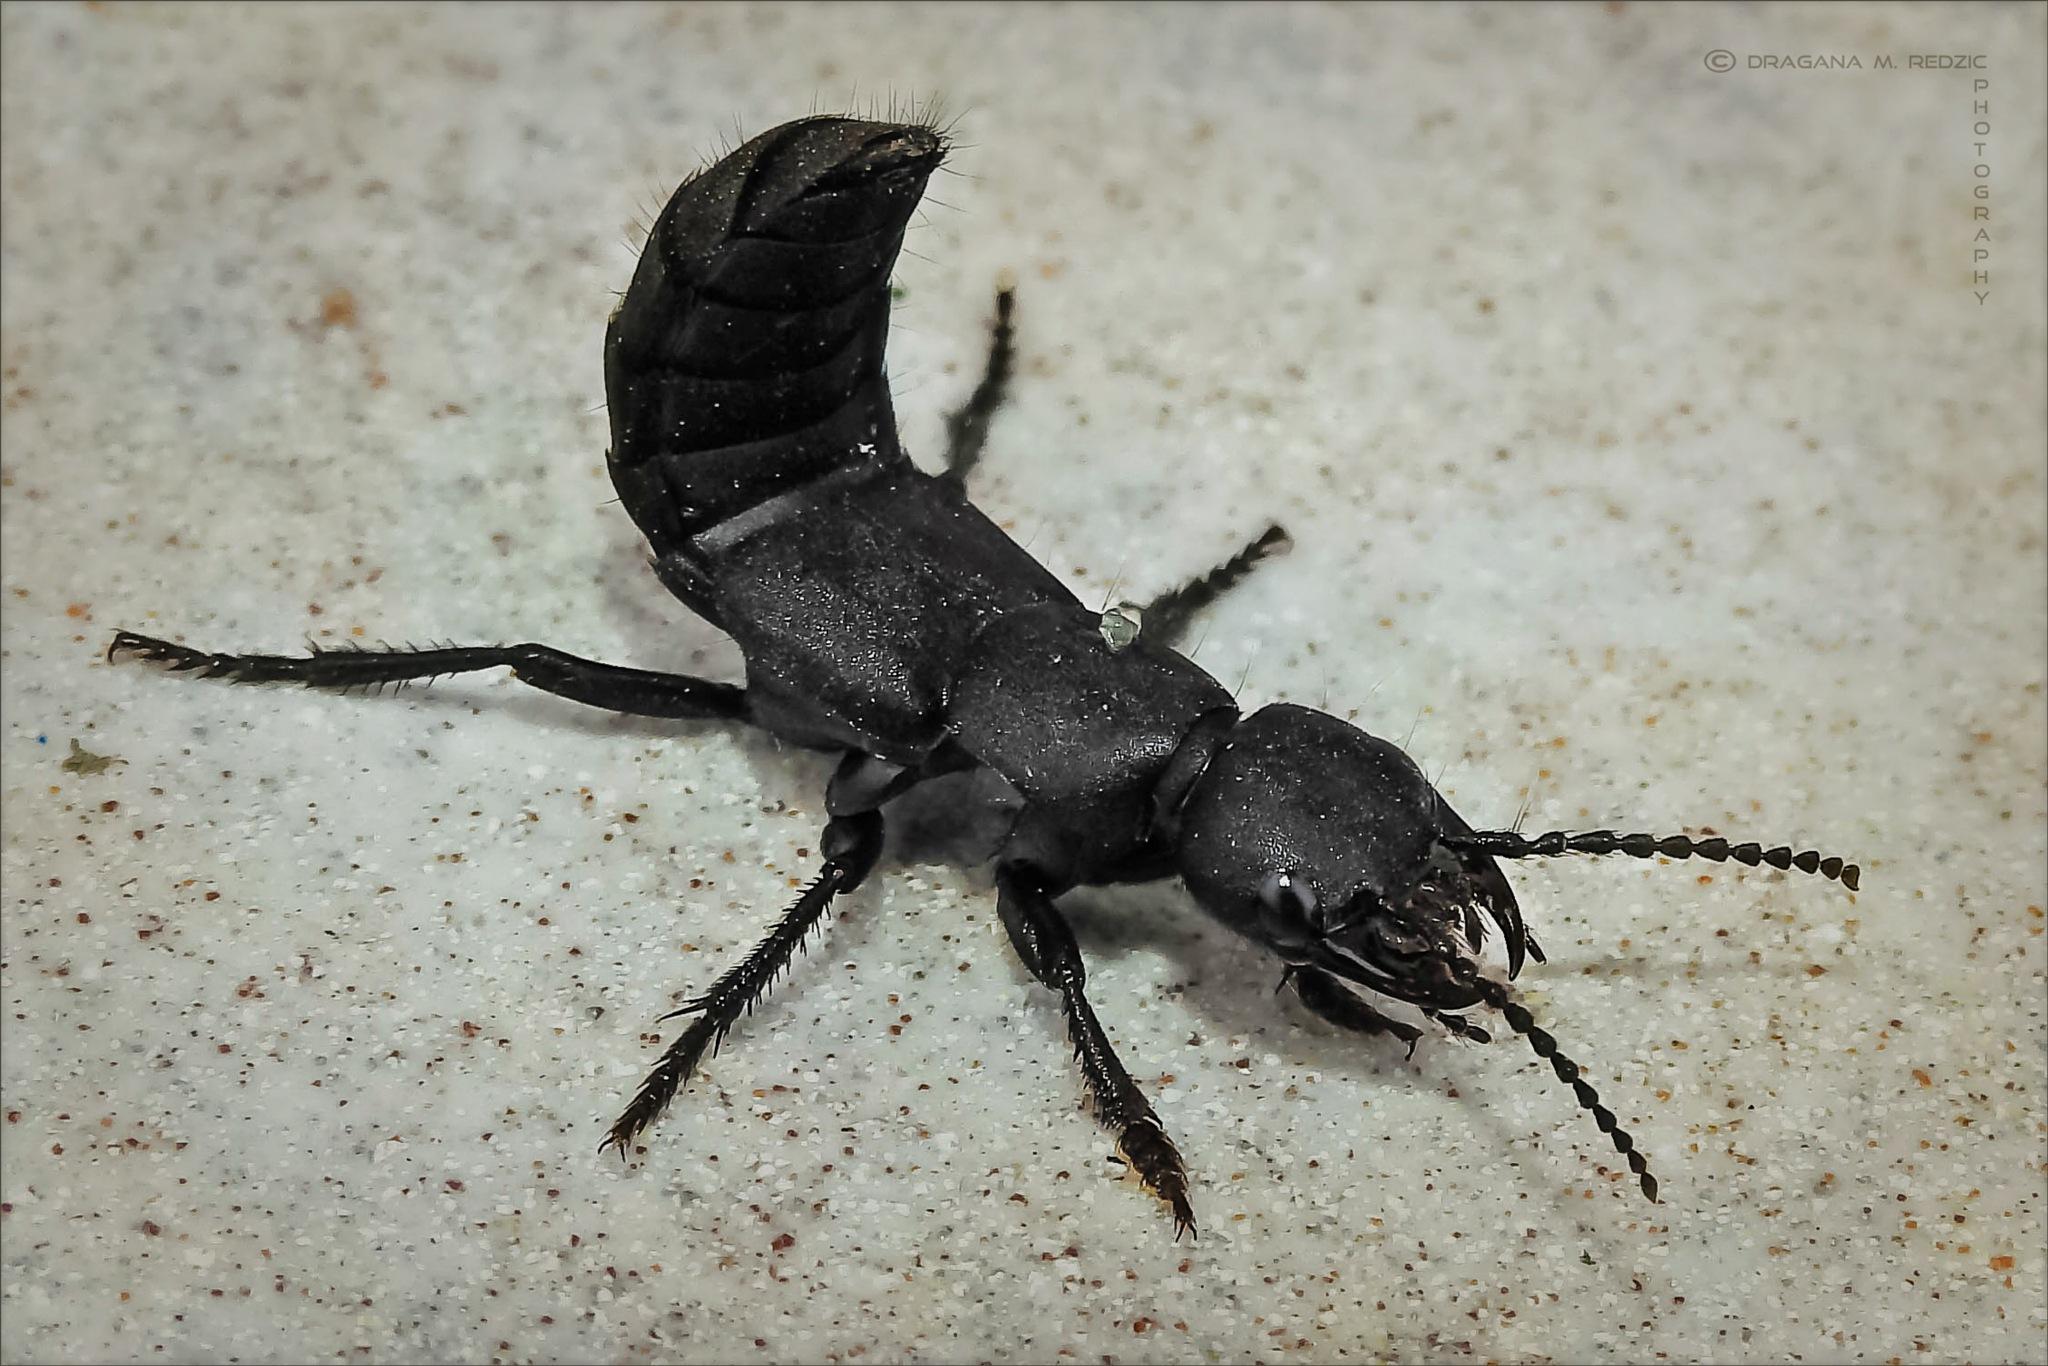 Đavolja buba ~ Devil's beetle ~ Ocypus olens L. by Драгана М. Реџић